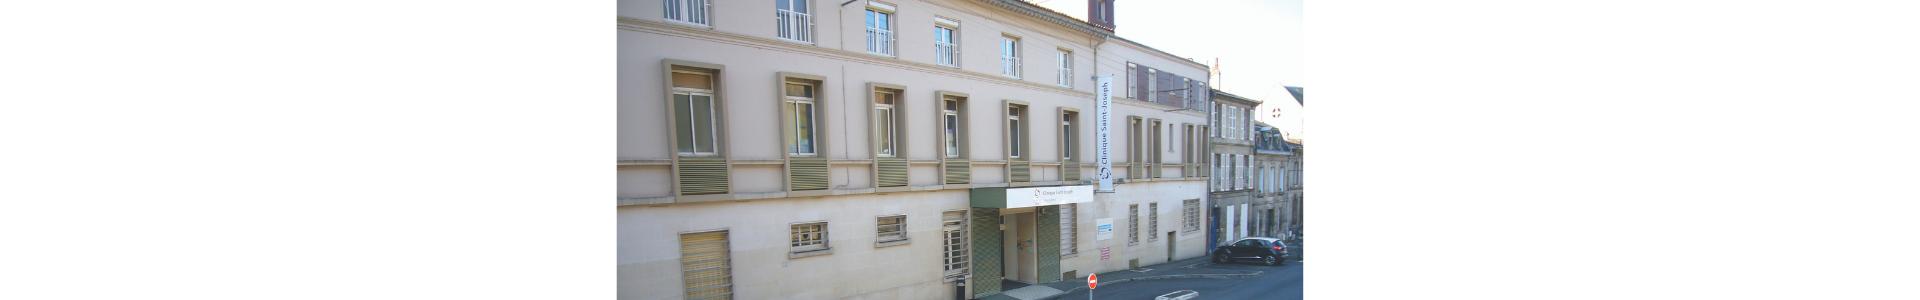 Façade entrée clinique saint-joseph à Angoulême